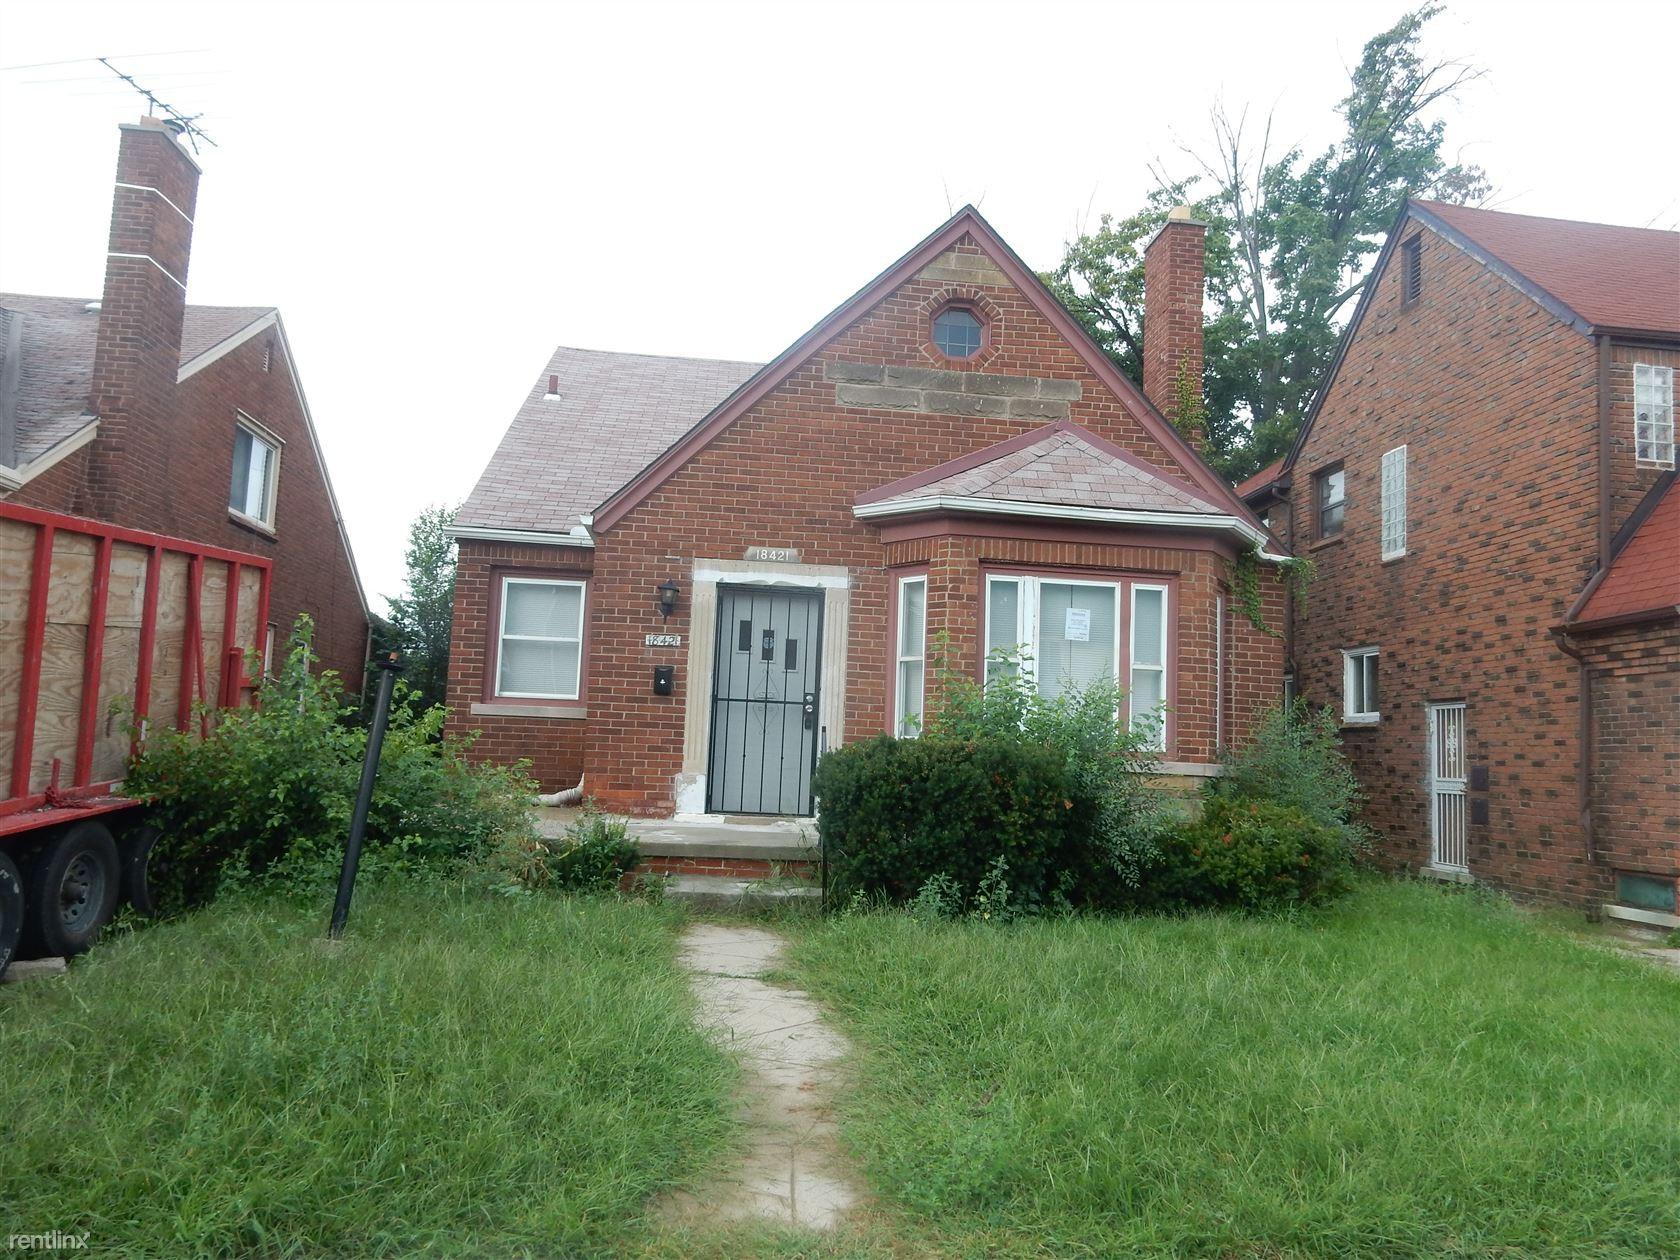 W 7 Mile Rd Detroit Mi 48221 3 Bedroom Apartment For Rent Padmapper